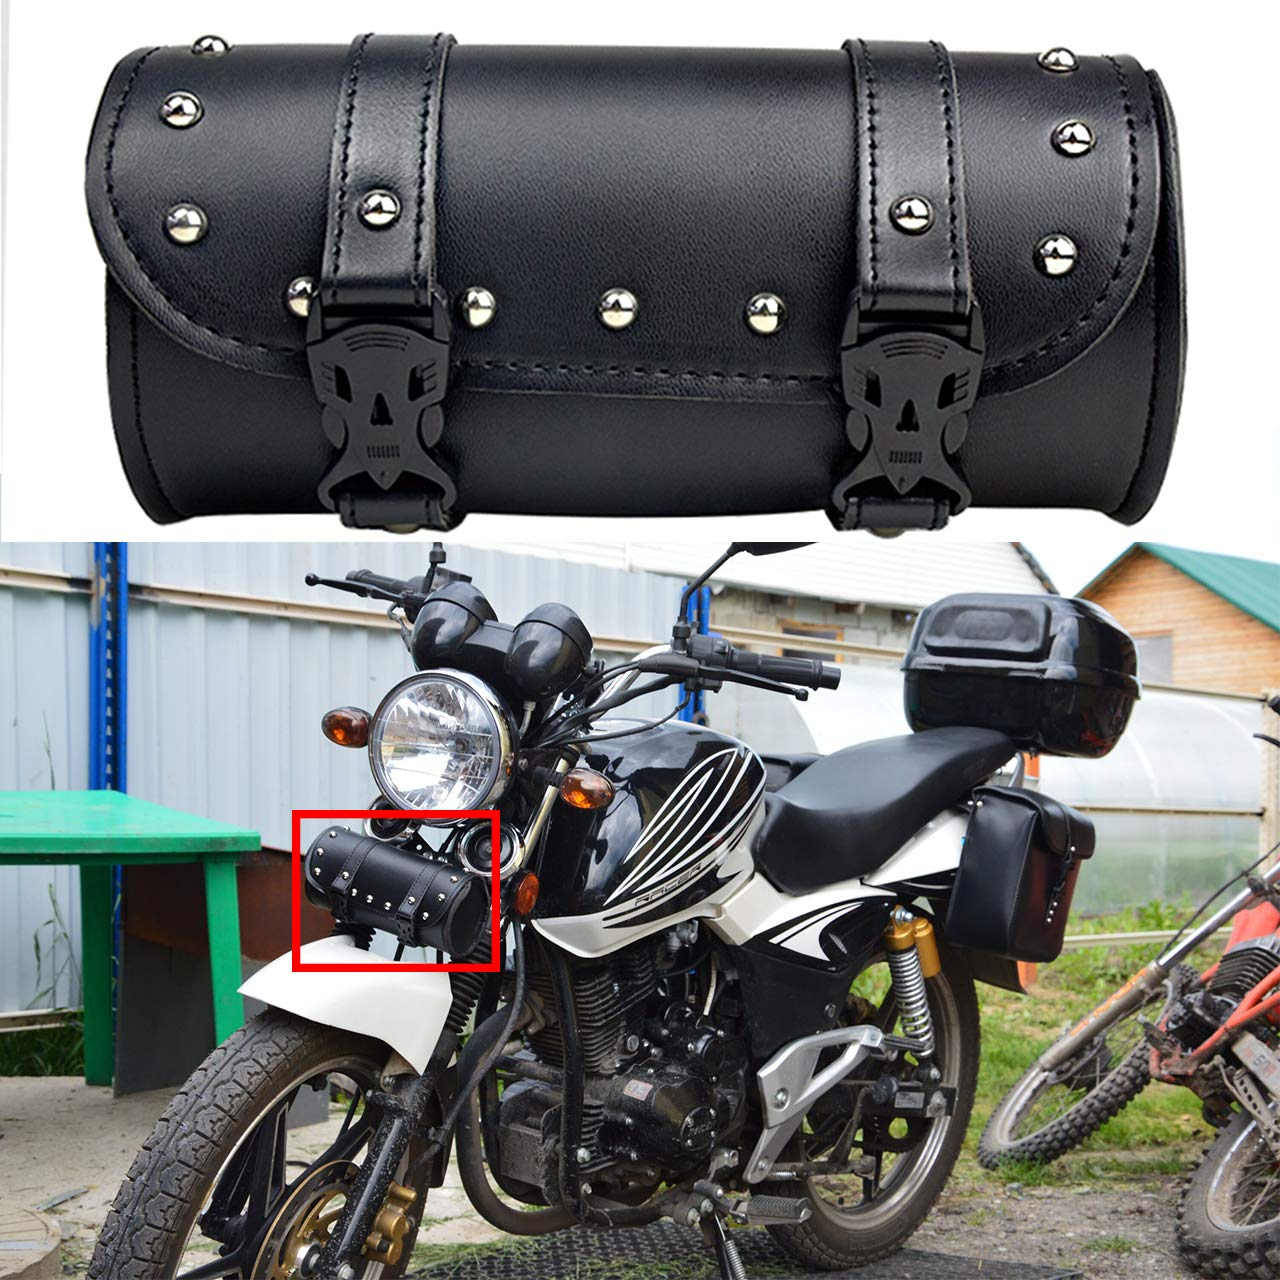 YHMTIVTU Motorcycle Handlebar Bag Roll Tool Bag PU Leather Saddlebags Storage Tool Pouch Brown